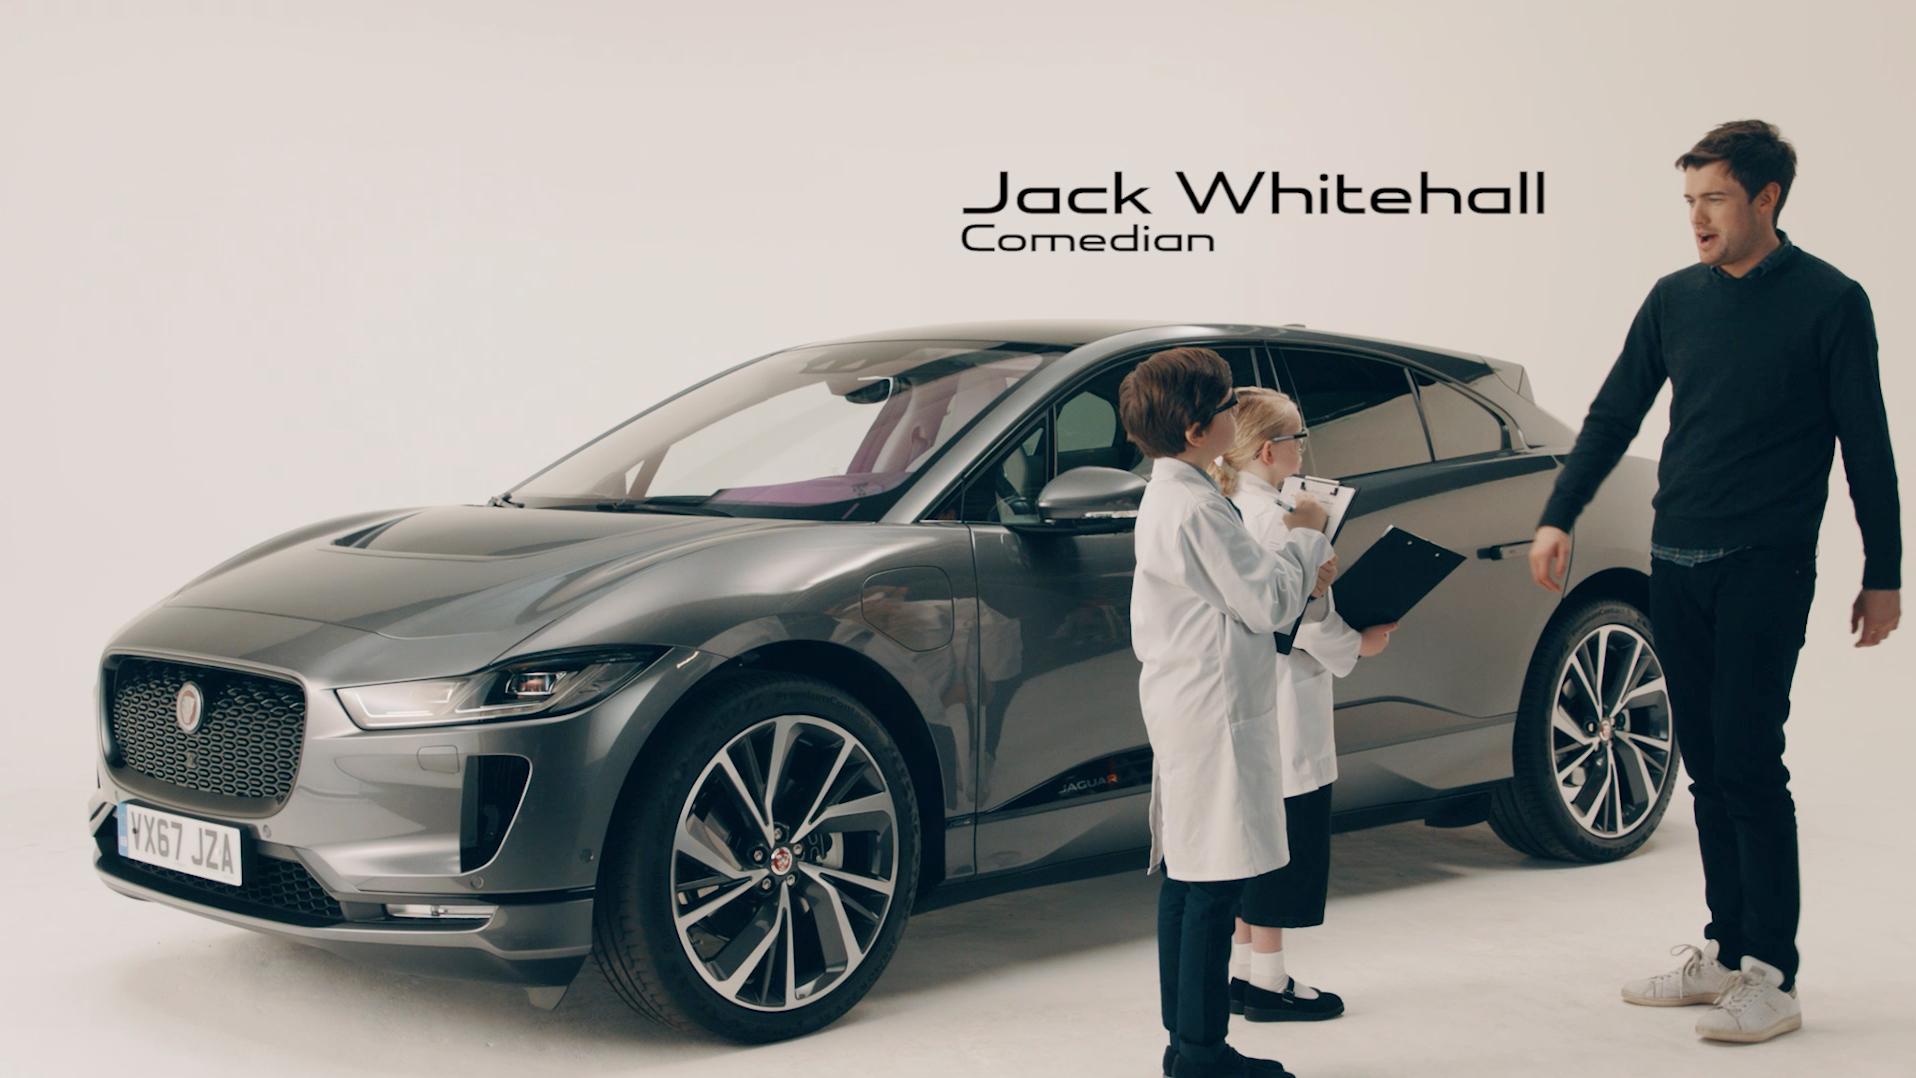 Jack Whitehall and kids 2019 Jaguar I-PACE technical.